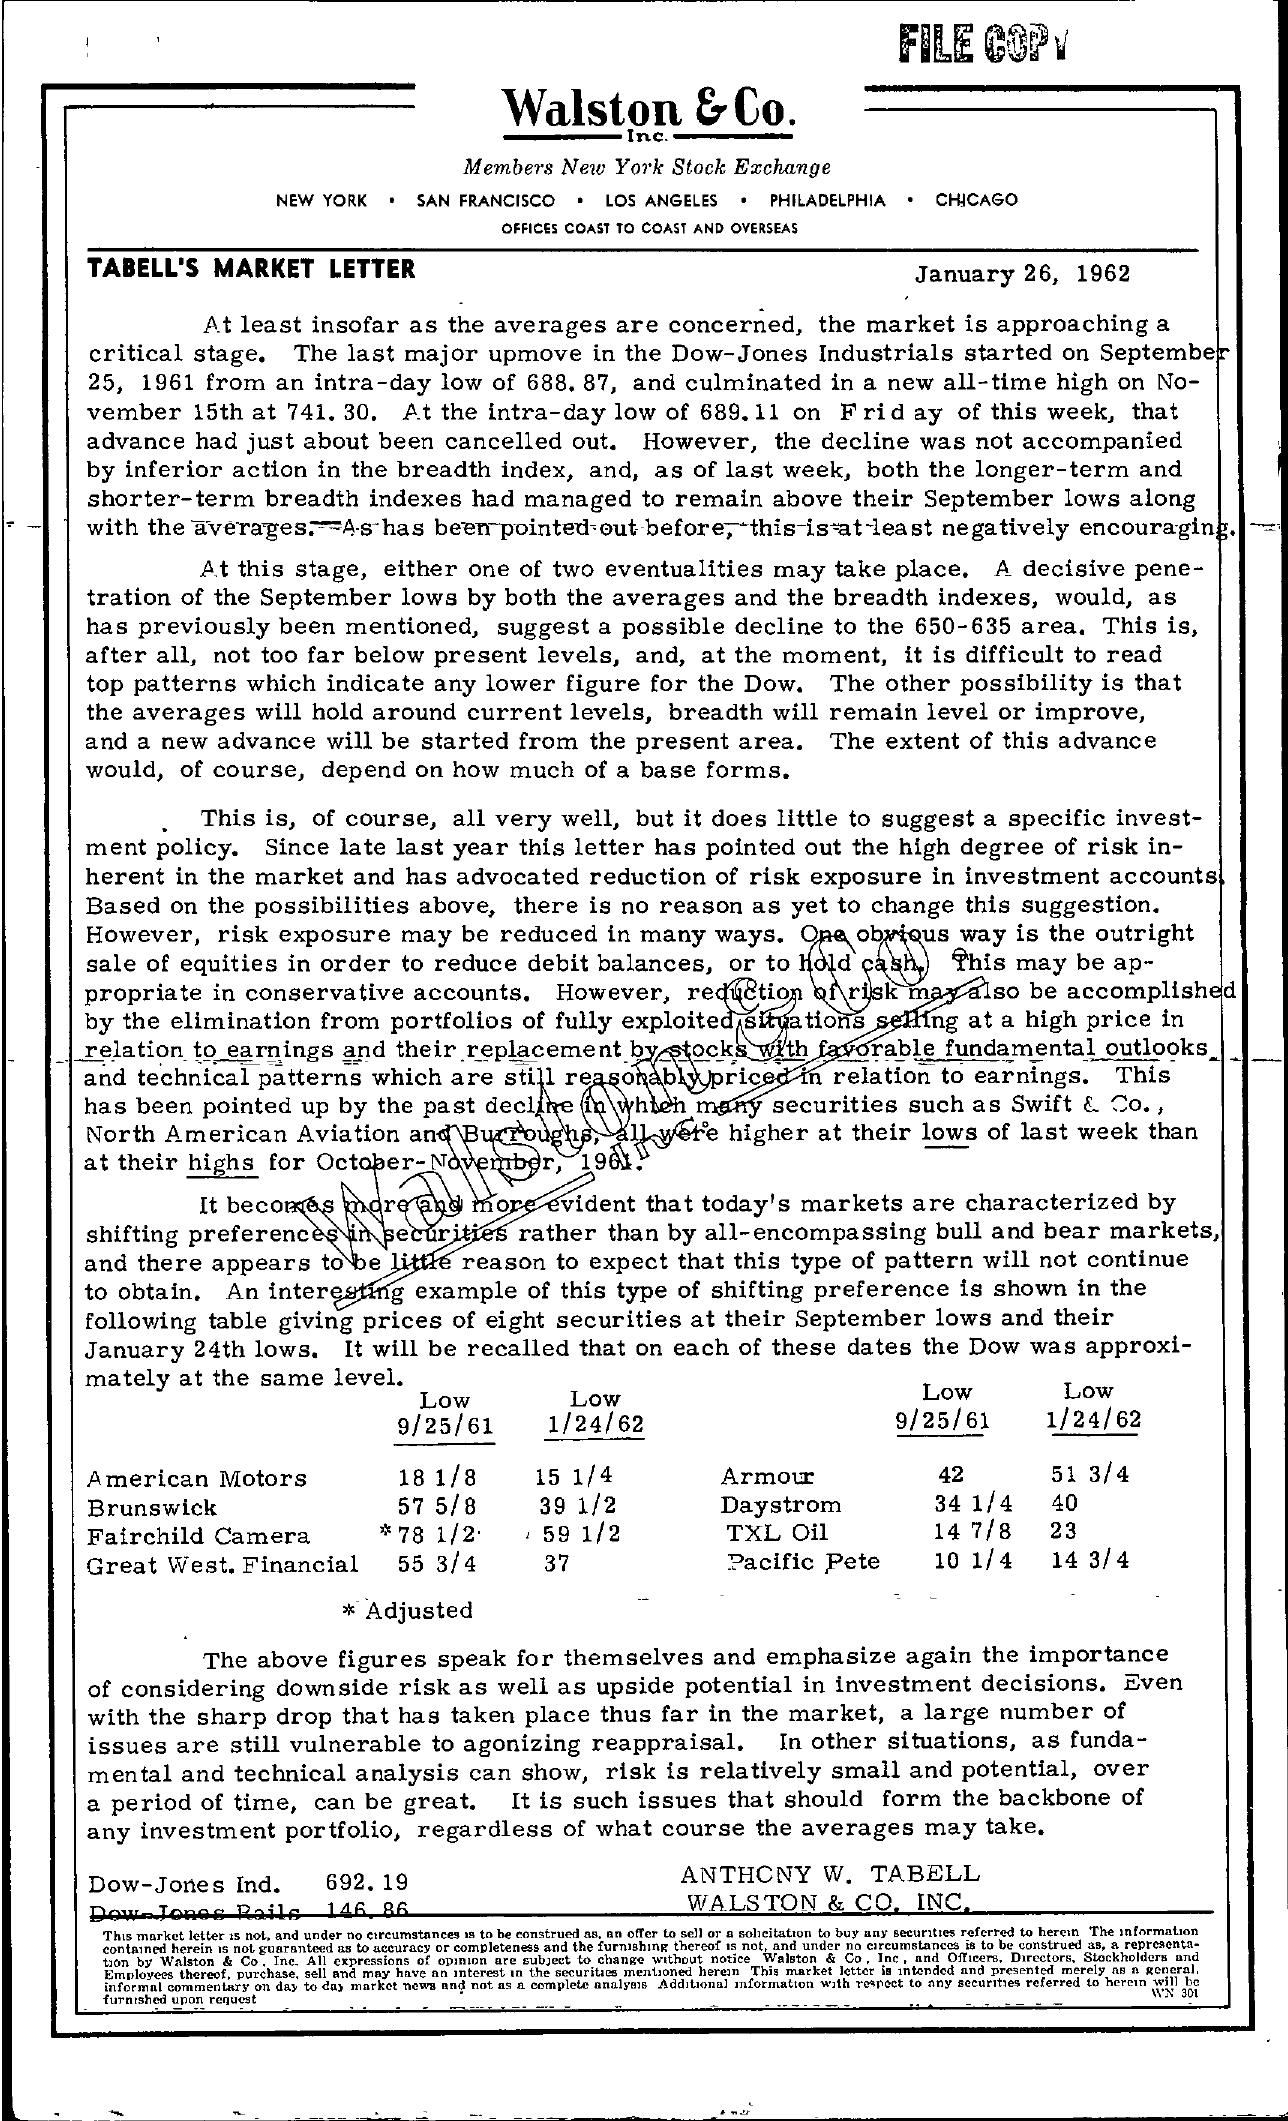 Tabell's Market Letter - January 26, 1962